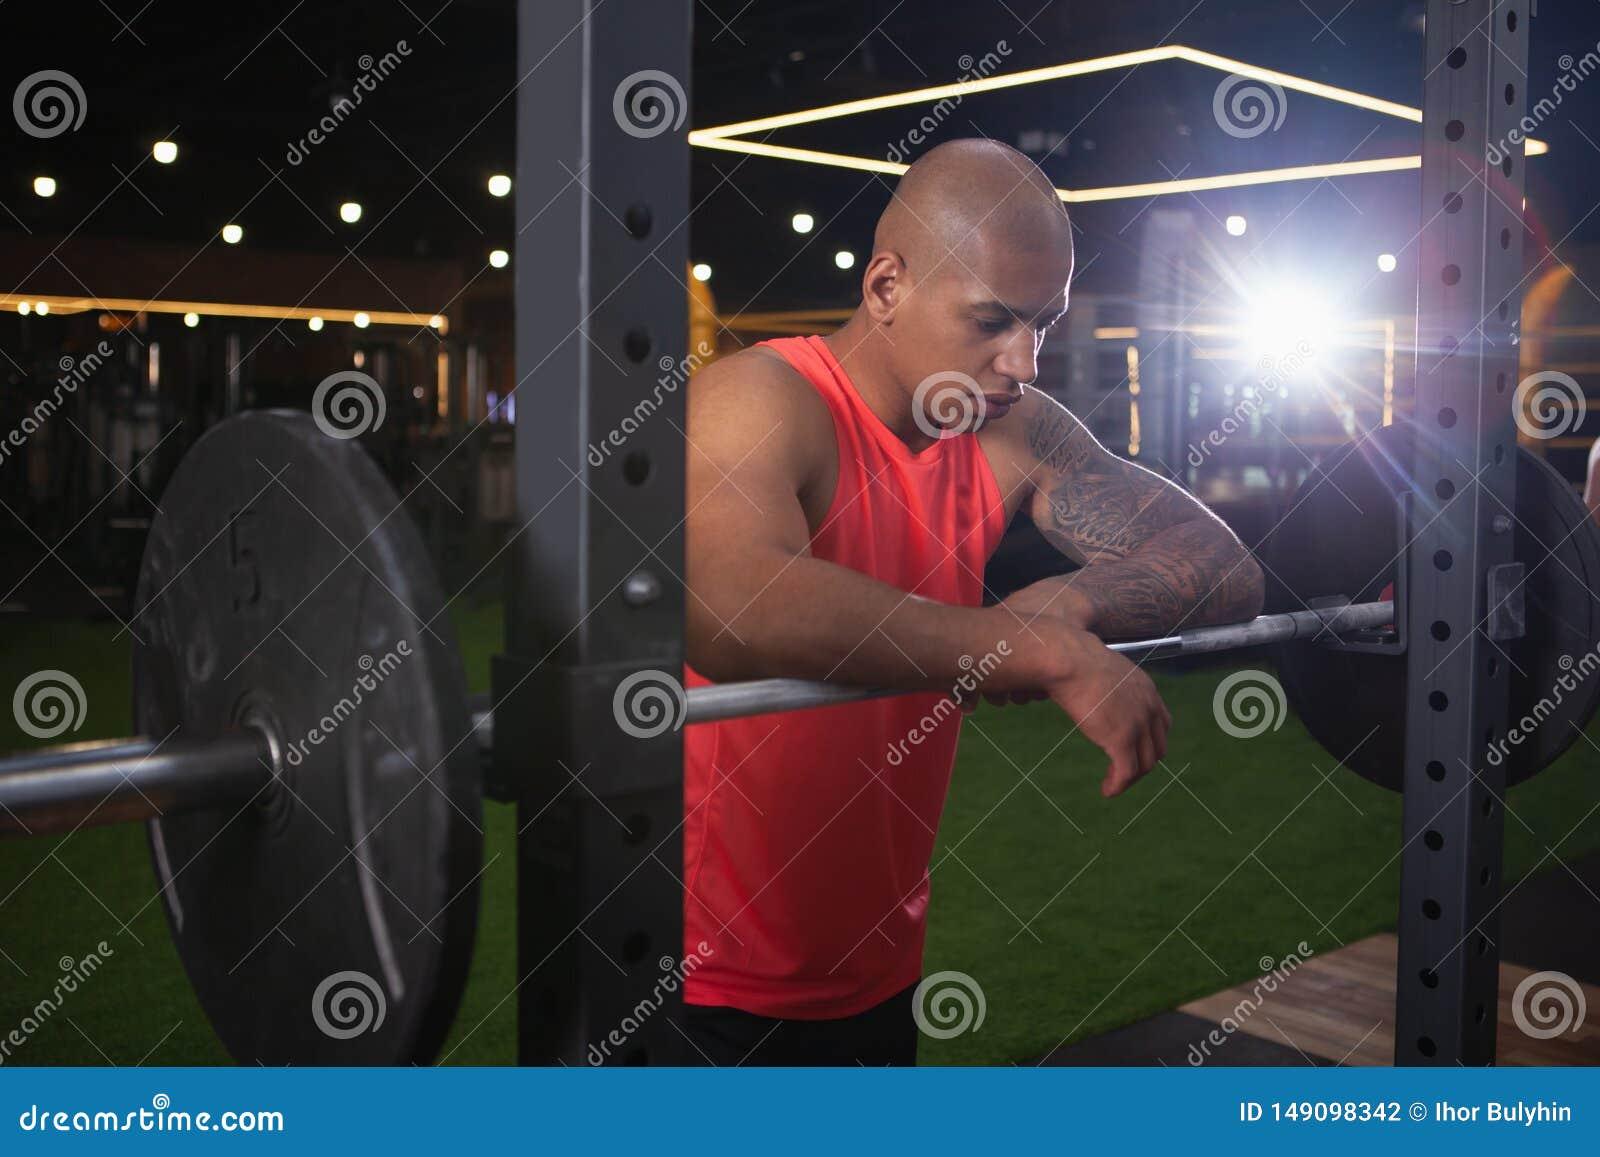 Atleta africano masculino consider?vel que d? certo no gym